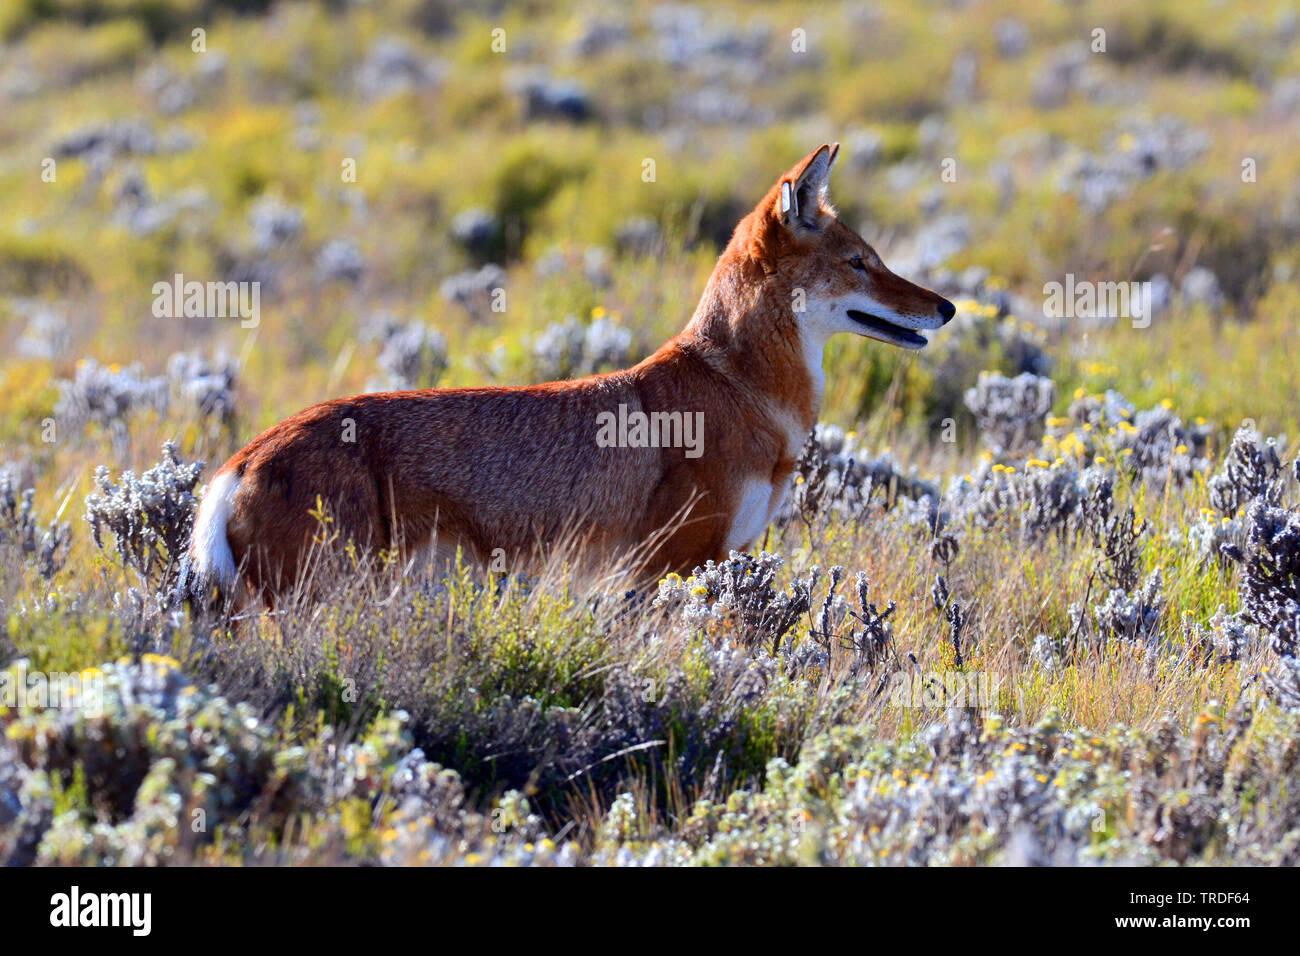 Abessinischer Fuchs, Aethiopischer Wolf (Canis simensis), in den Bale Mountains, Aethiopien, Bale Mountains Nationalpark   Simien jackal, Ethiopian wo - Stock Image